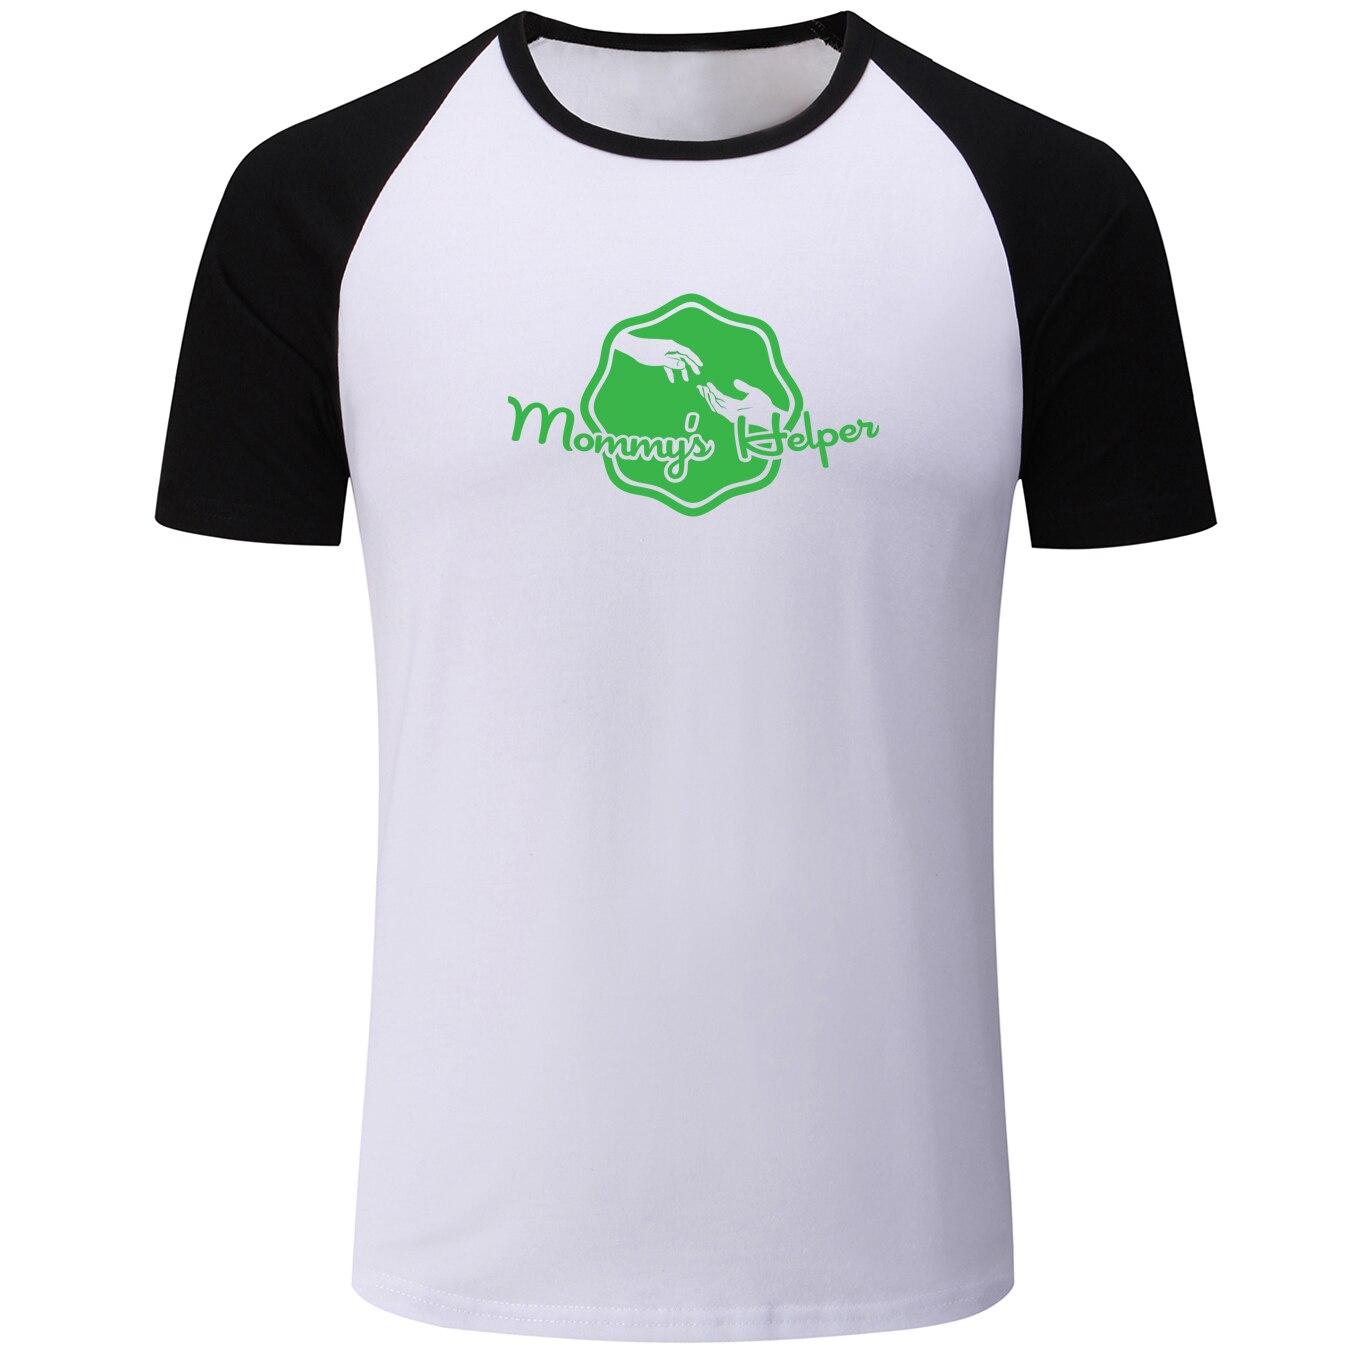 Okayest del mundo mamá papá o mamá y yo ayudante de mamá Mens verano camiseta niños gráfico Tee Casual Raglan camisetas